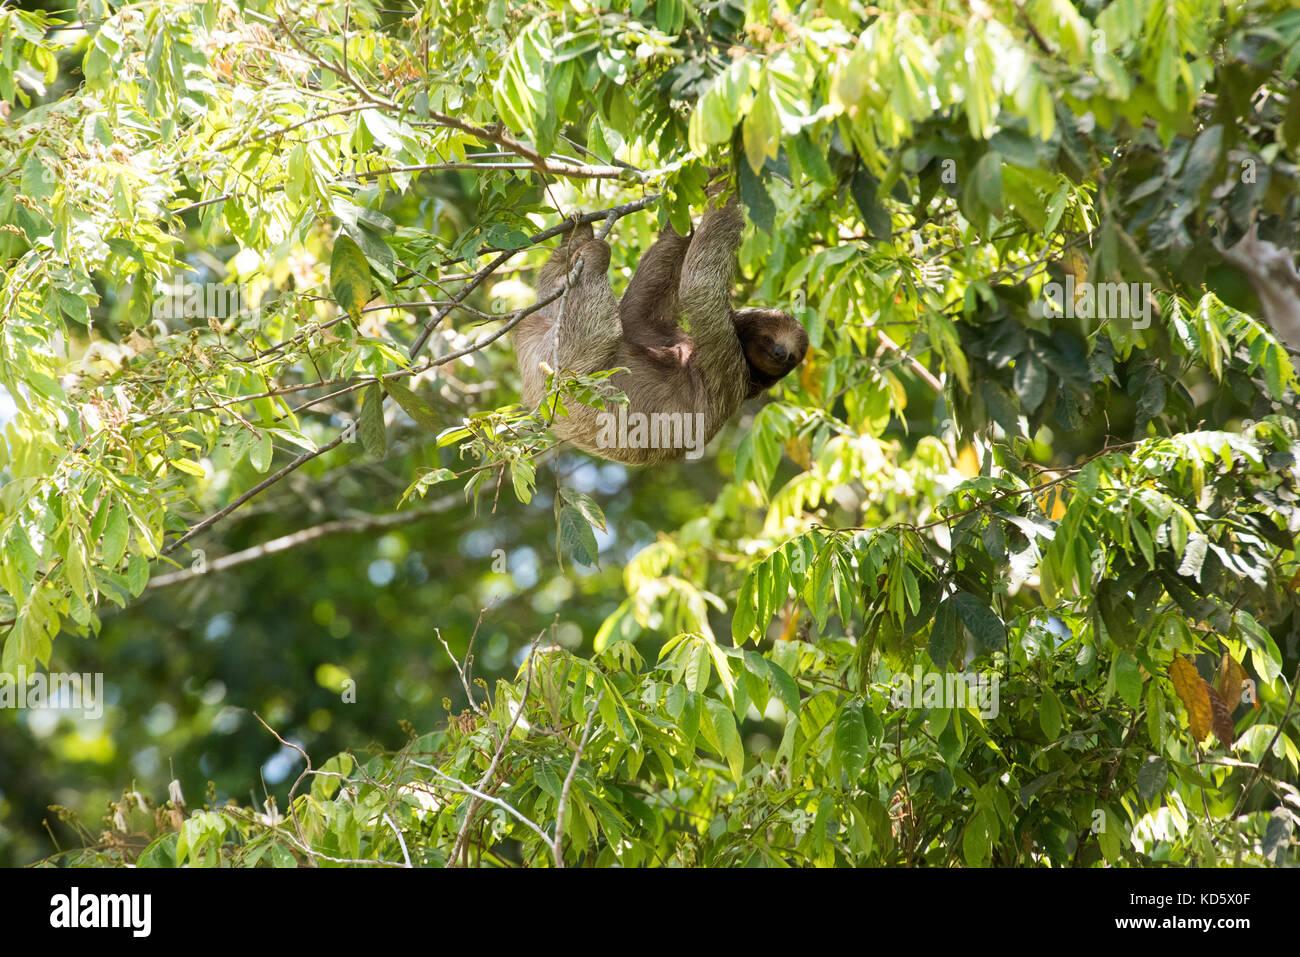 Perezoso de tres dedos colgando de un árbol, Costa Rica Foto de stock